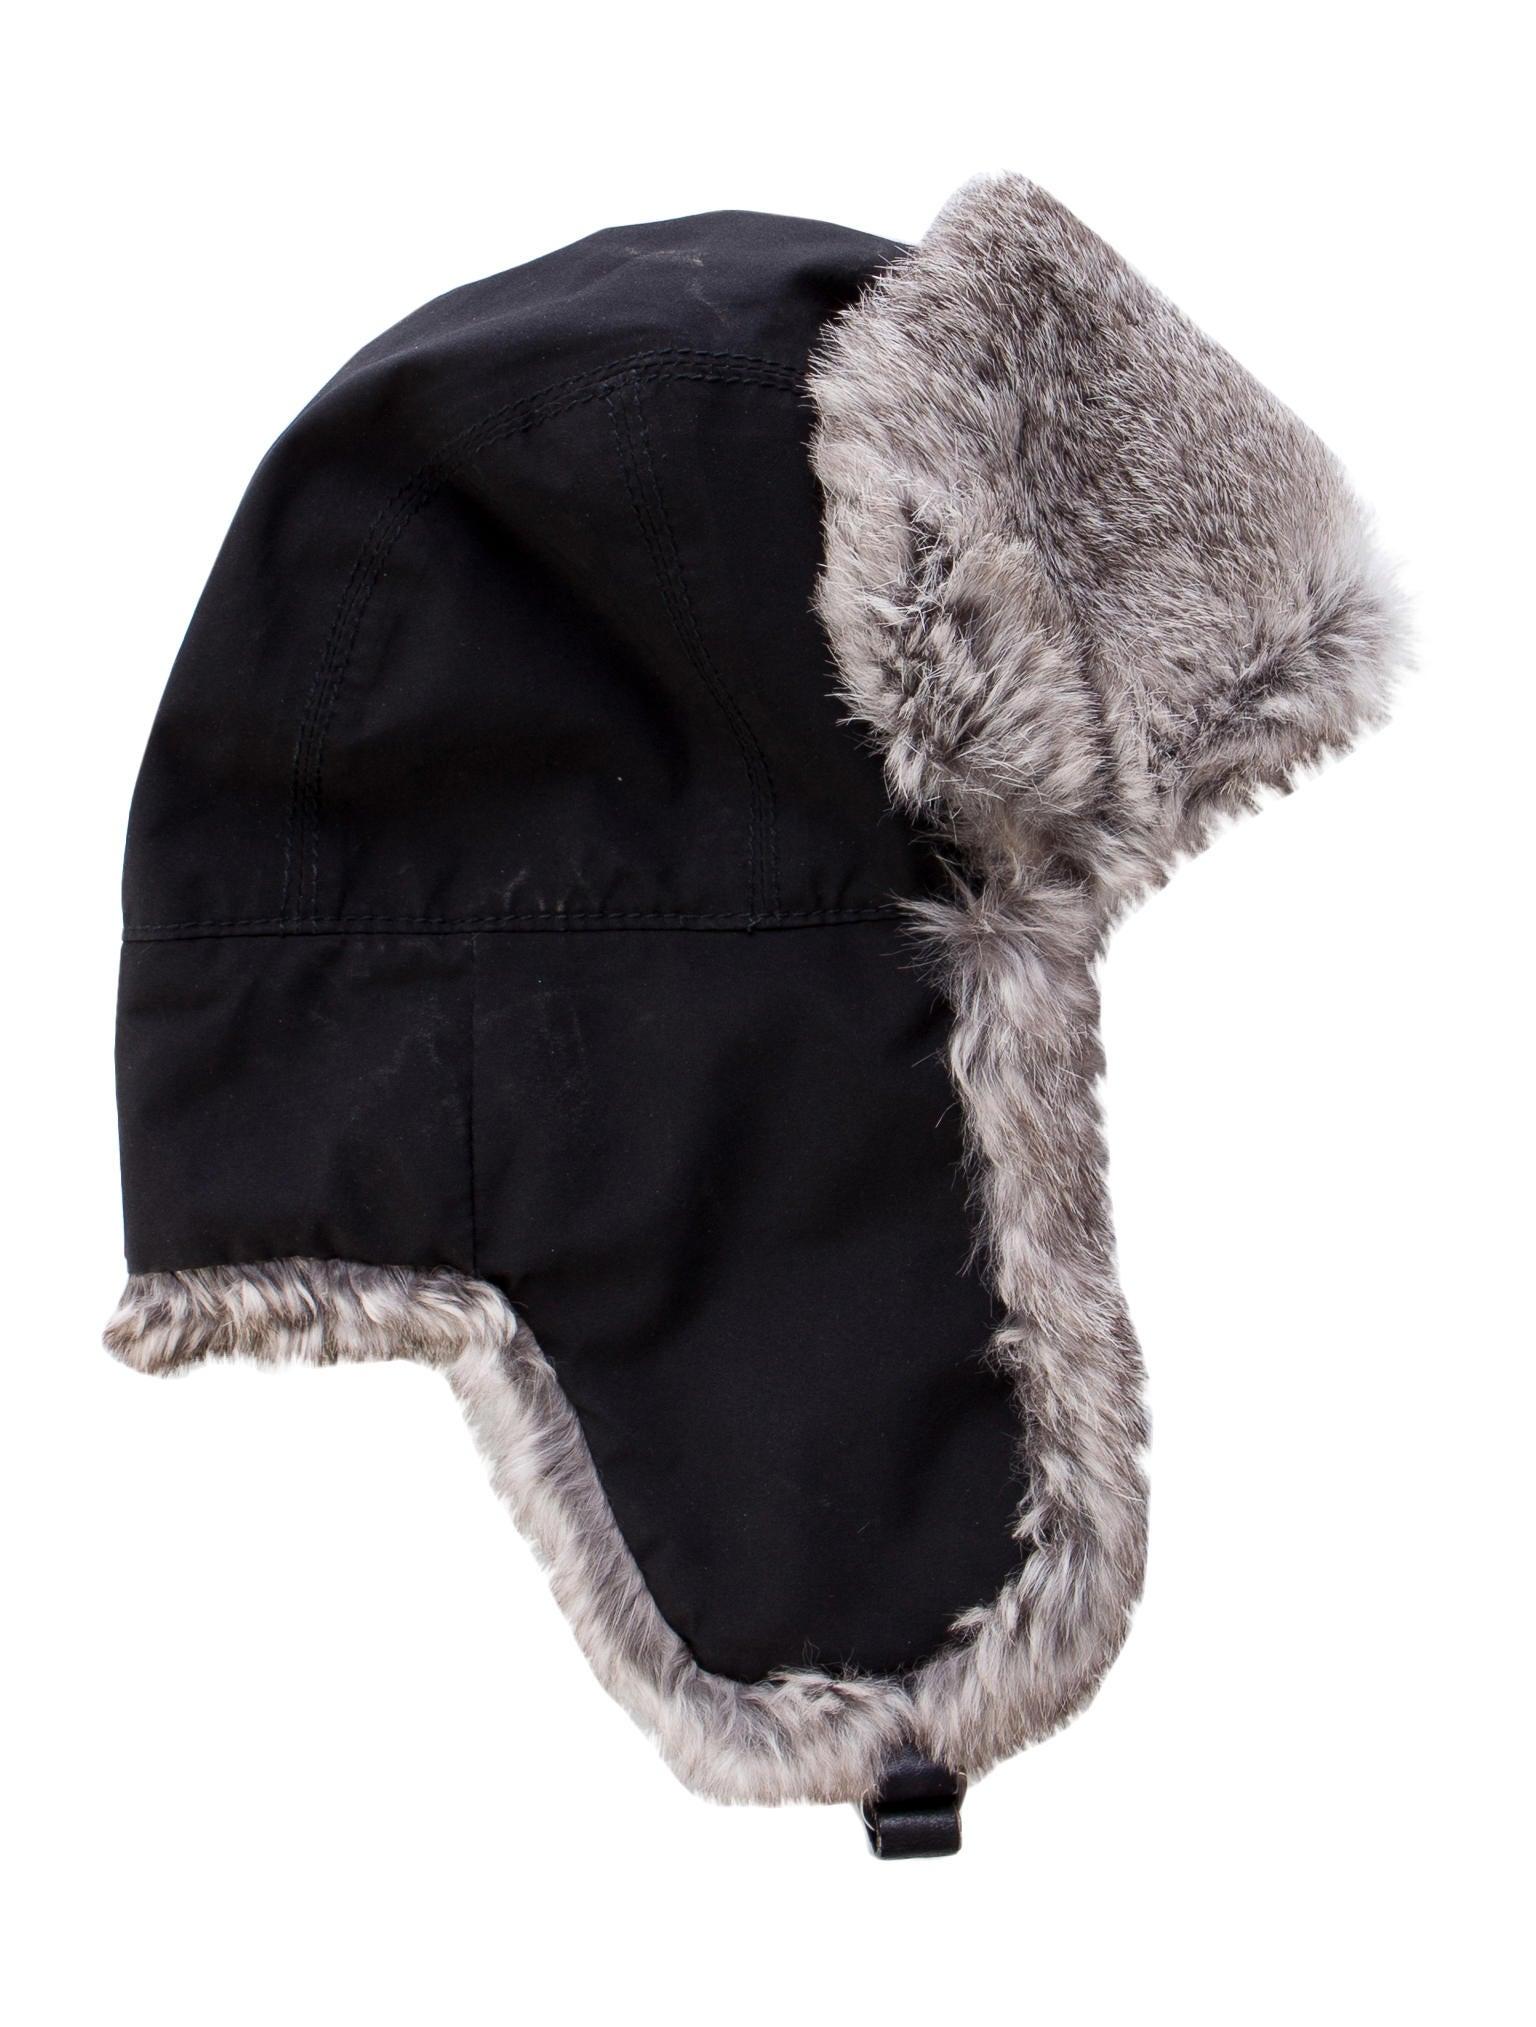 8f8559bfd2b Prada Sport Nylon Trapper Hat - Accessories - WPR38265